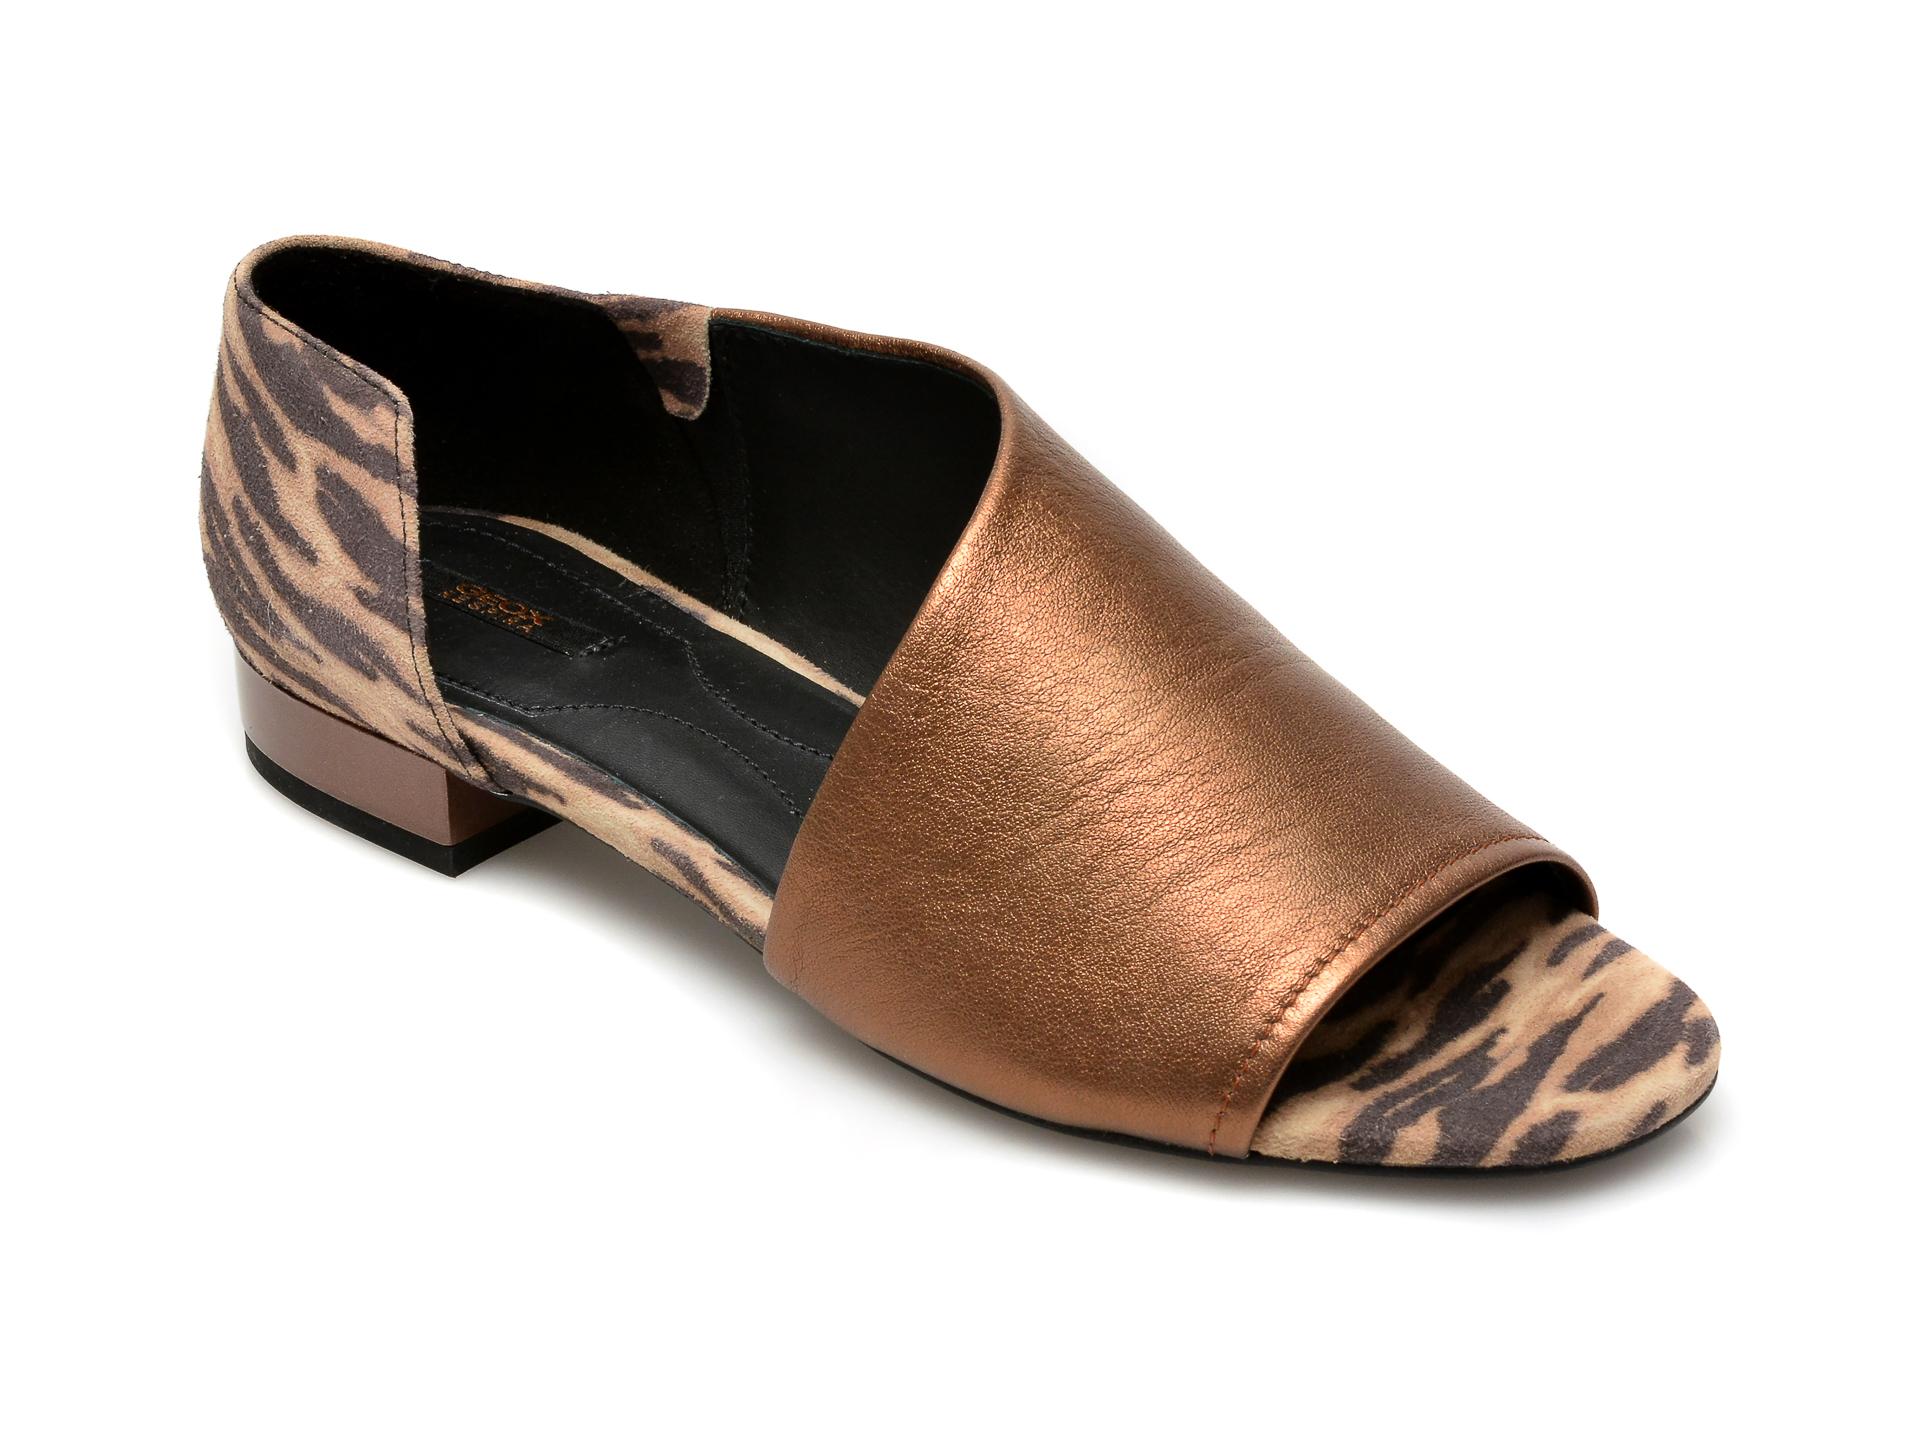 Sandale GEOX maro, D724HA, din piele naturala imagine otter.ro 2021